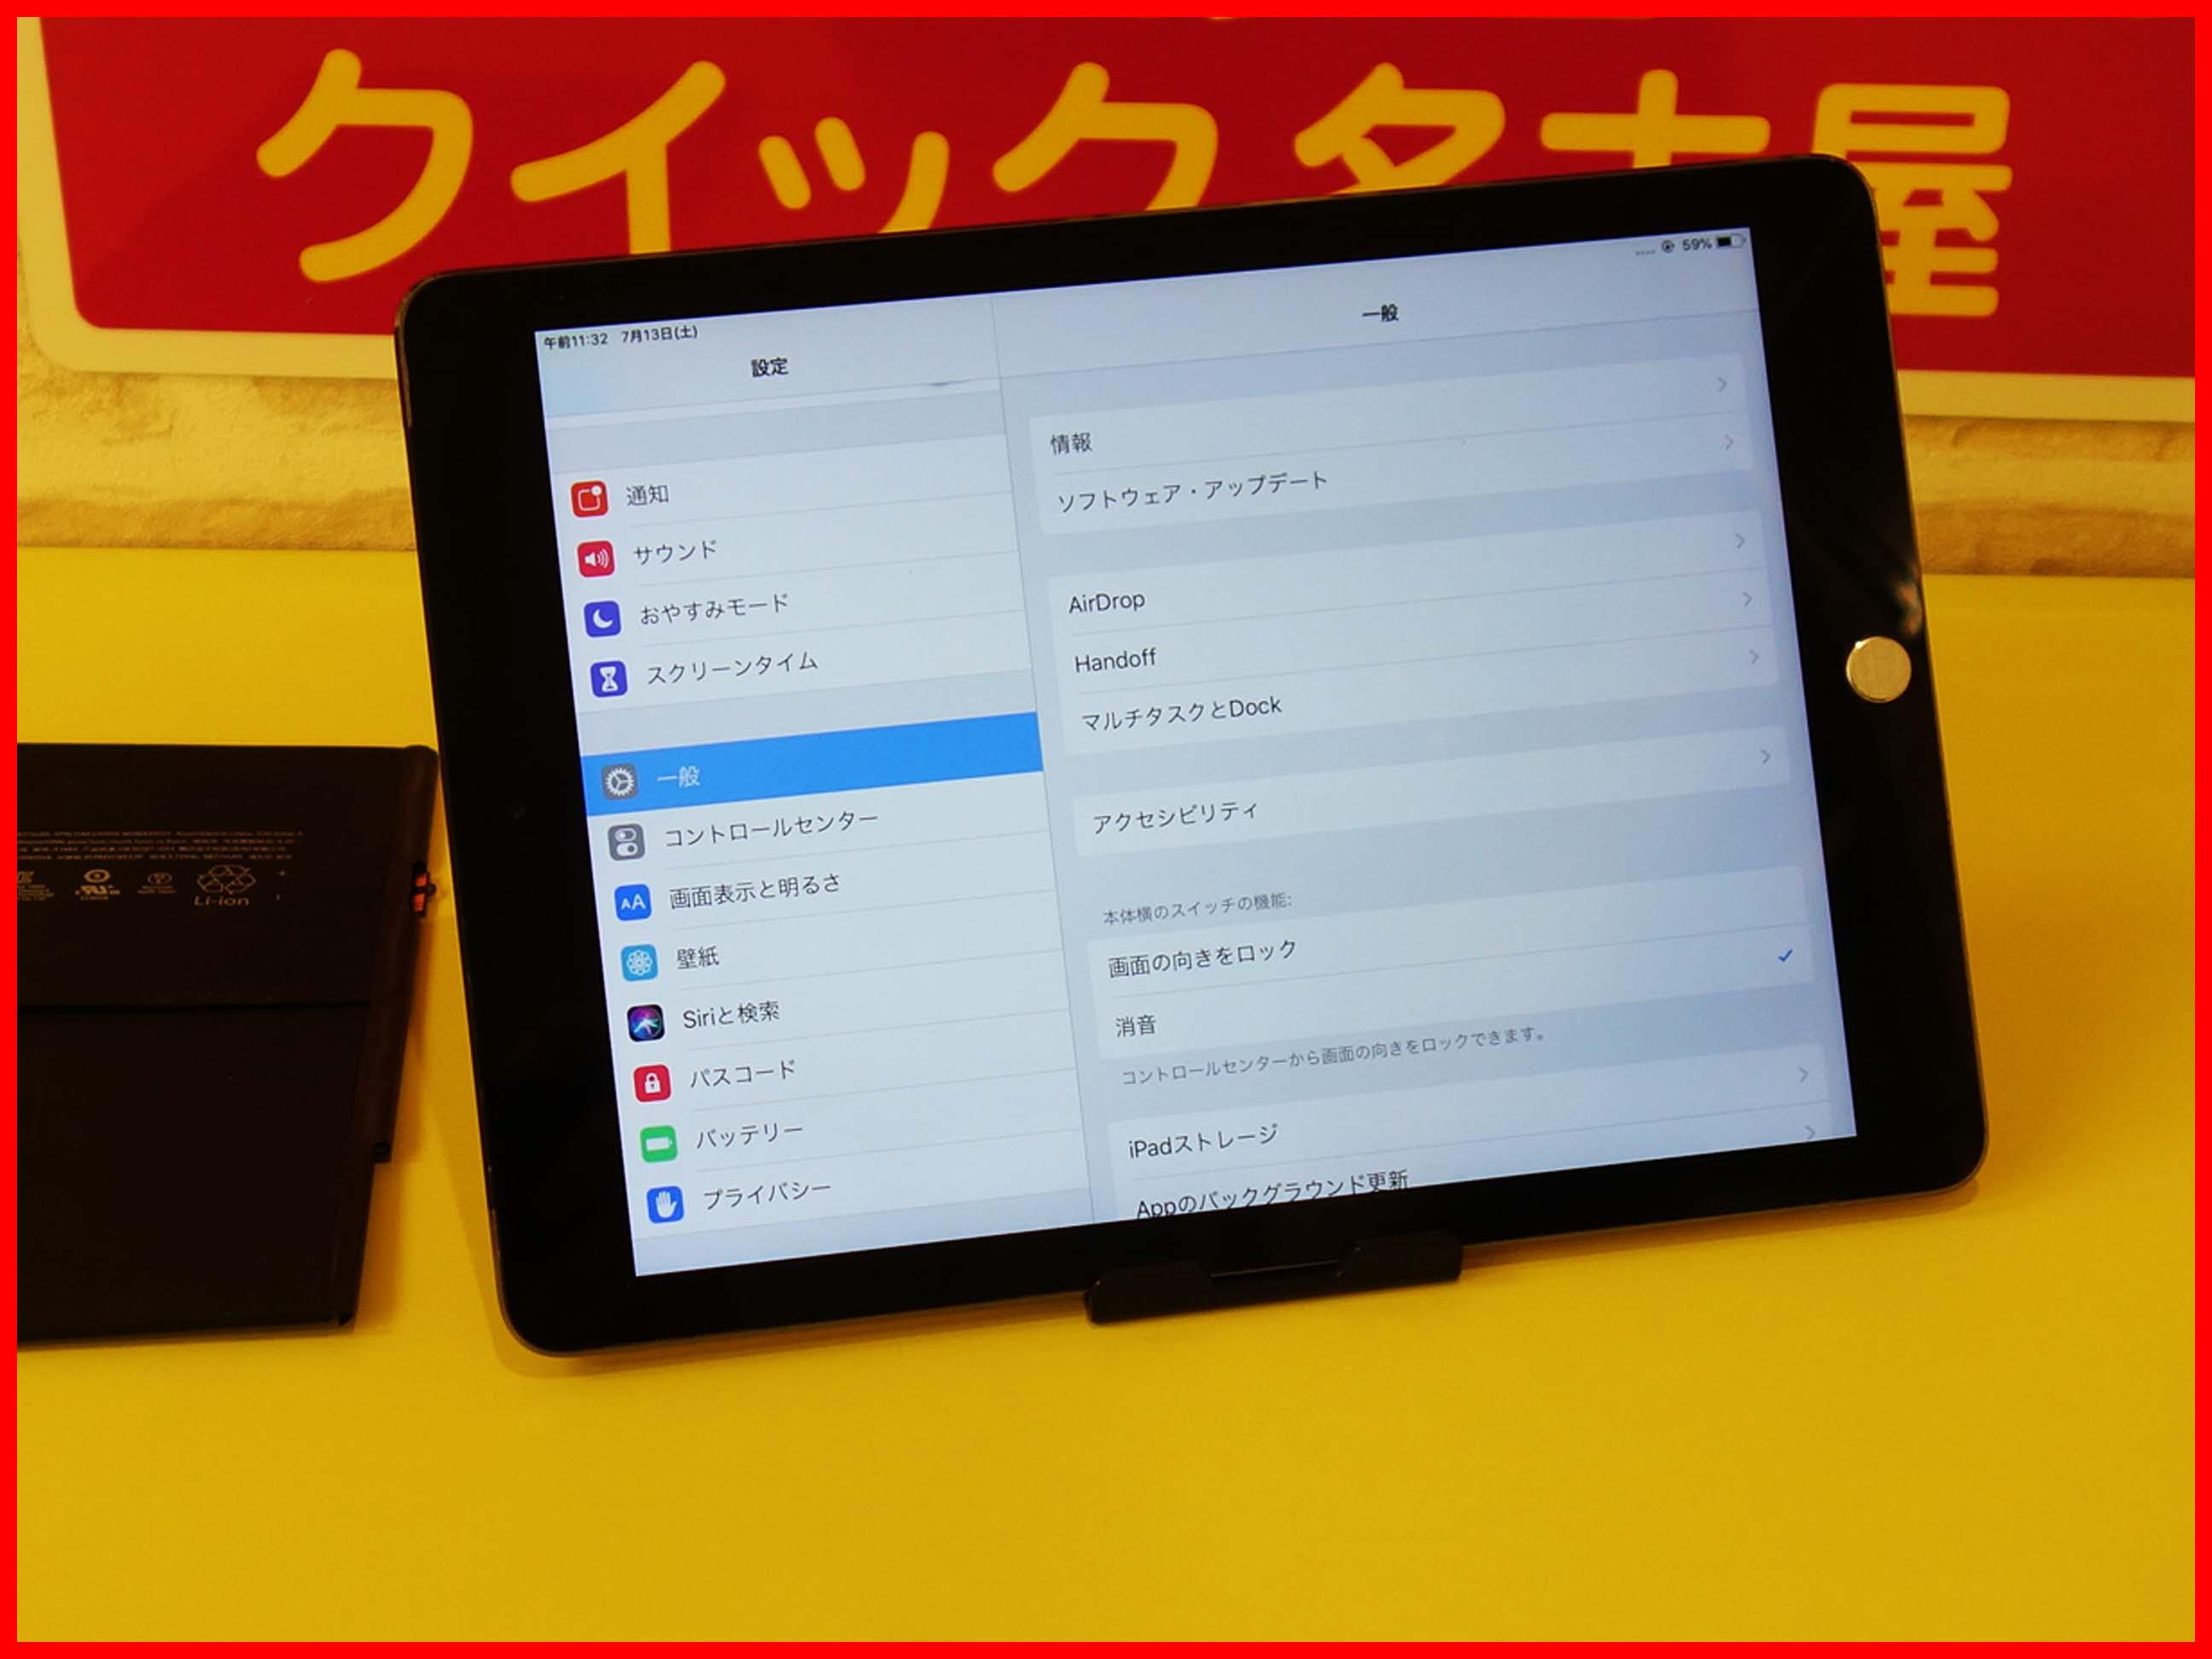 iPadAir1のバッテリー交換修理に豊田市よりご来店!アイパッド修理もクイック名古屋